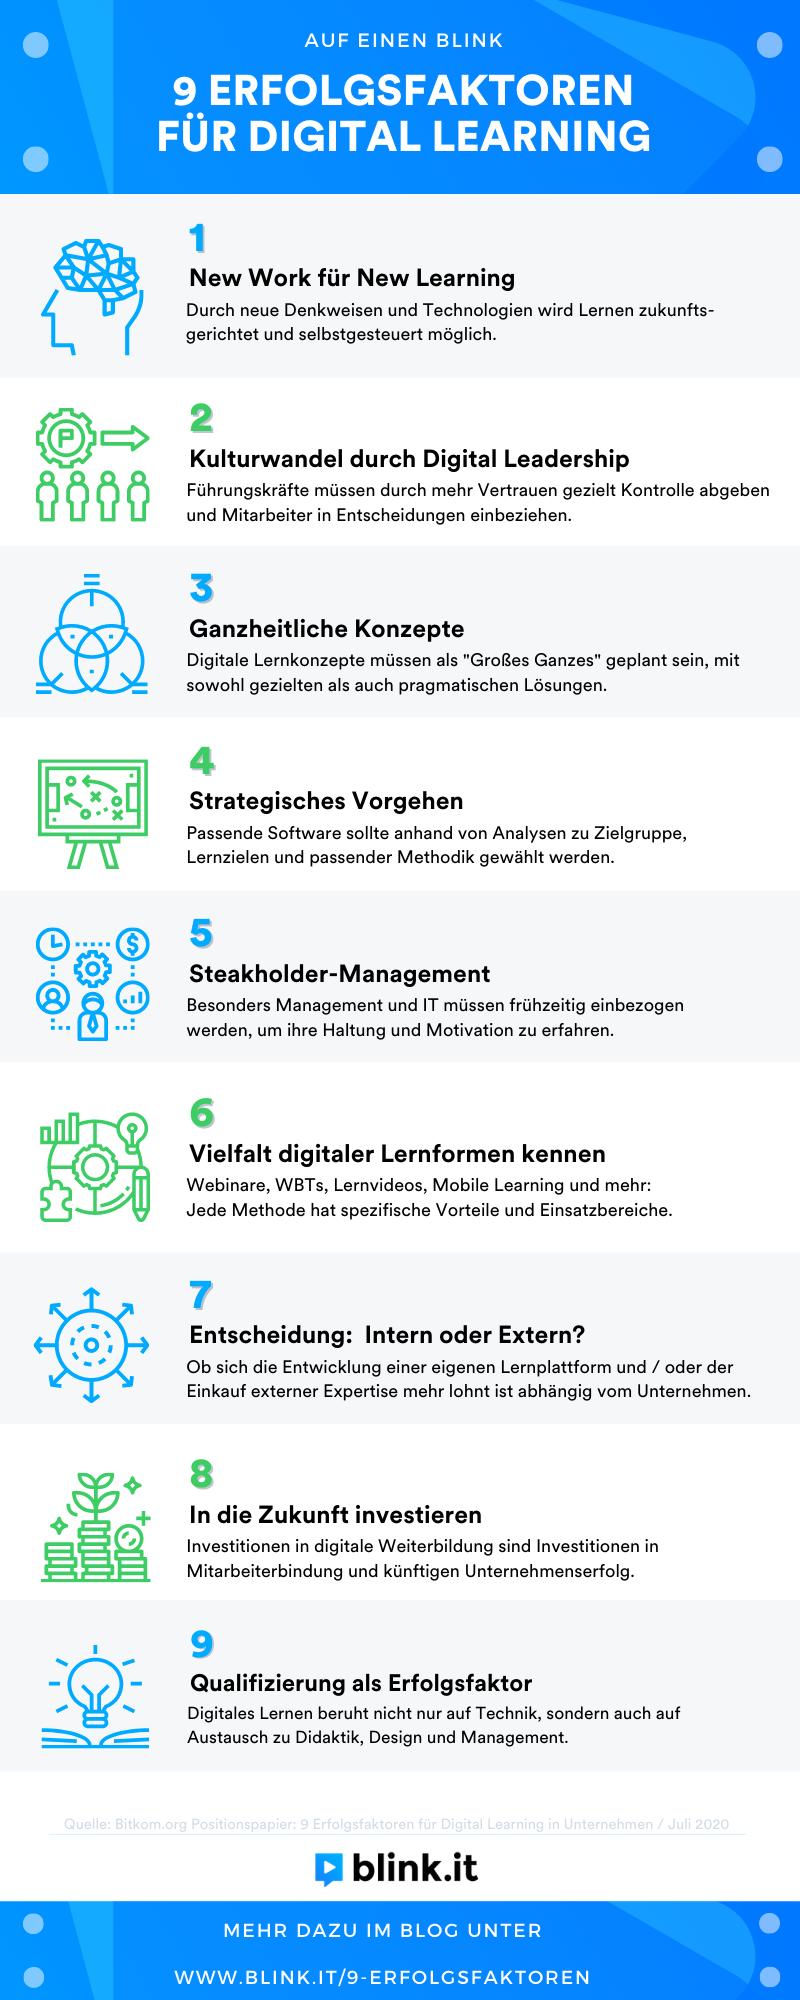 blink.it Infografik: 9 Erfolgsfaktoren für Digital Learning